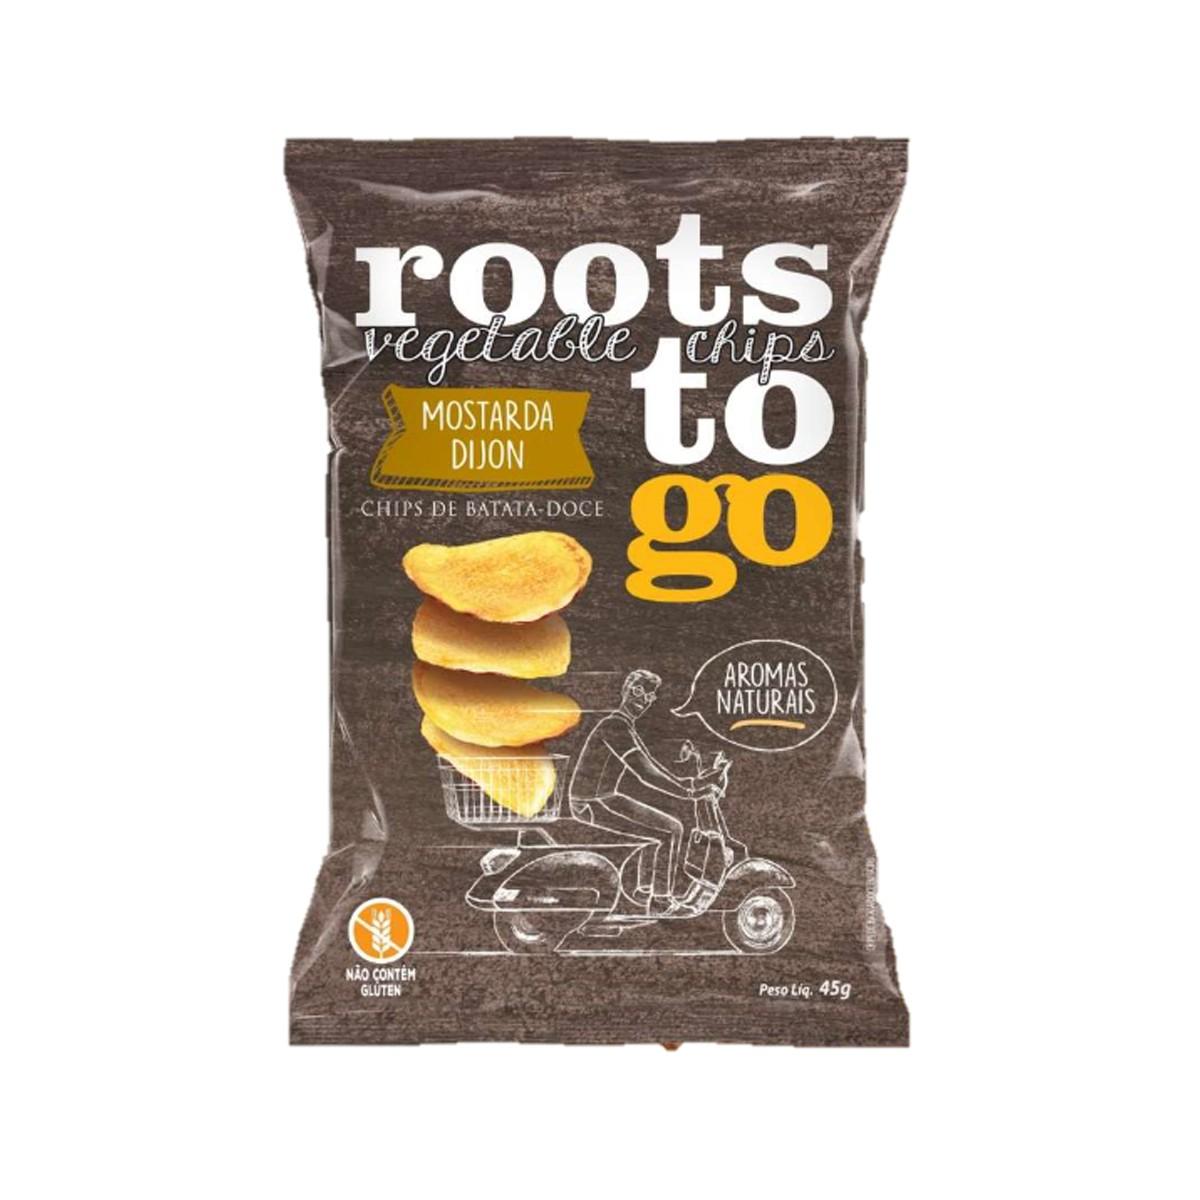 Chips de Batata Doce Sabor Mostarda Dijon 45g - Roots To Go